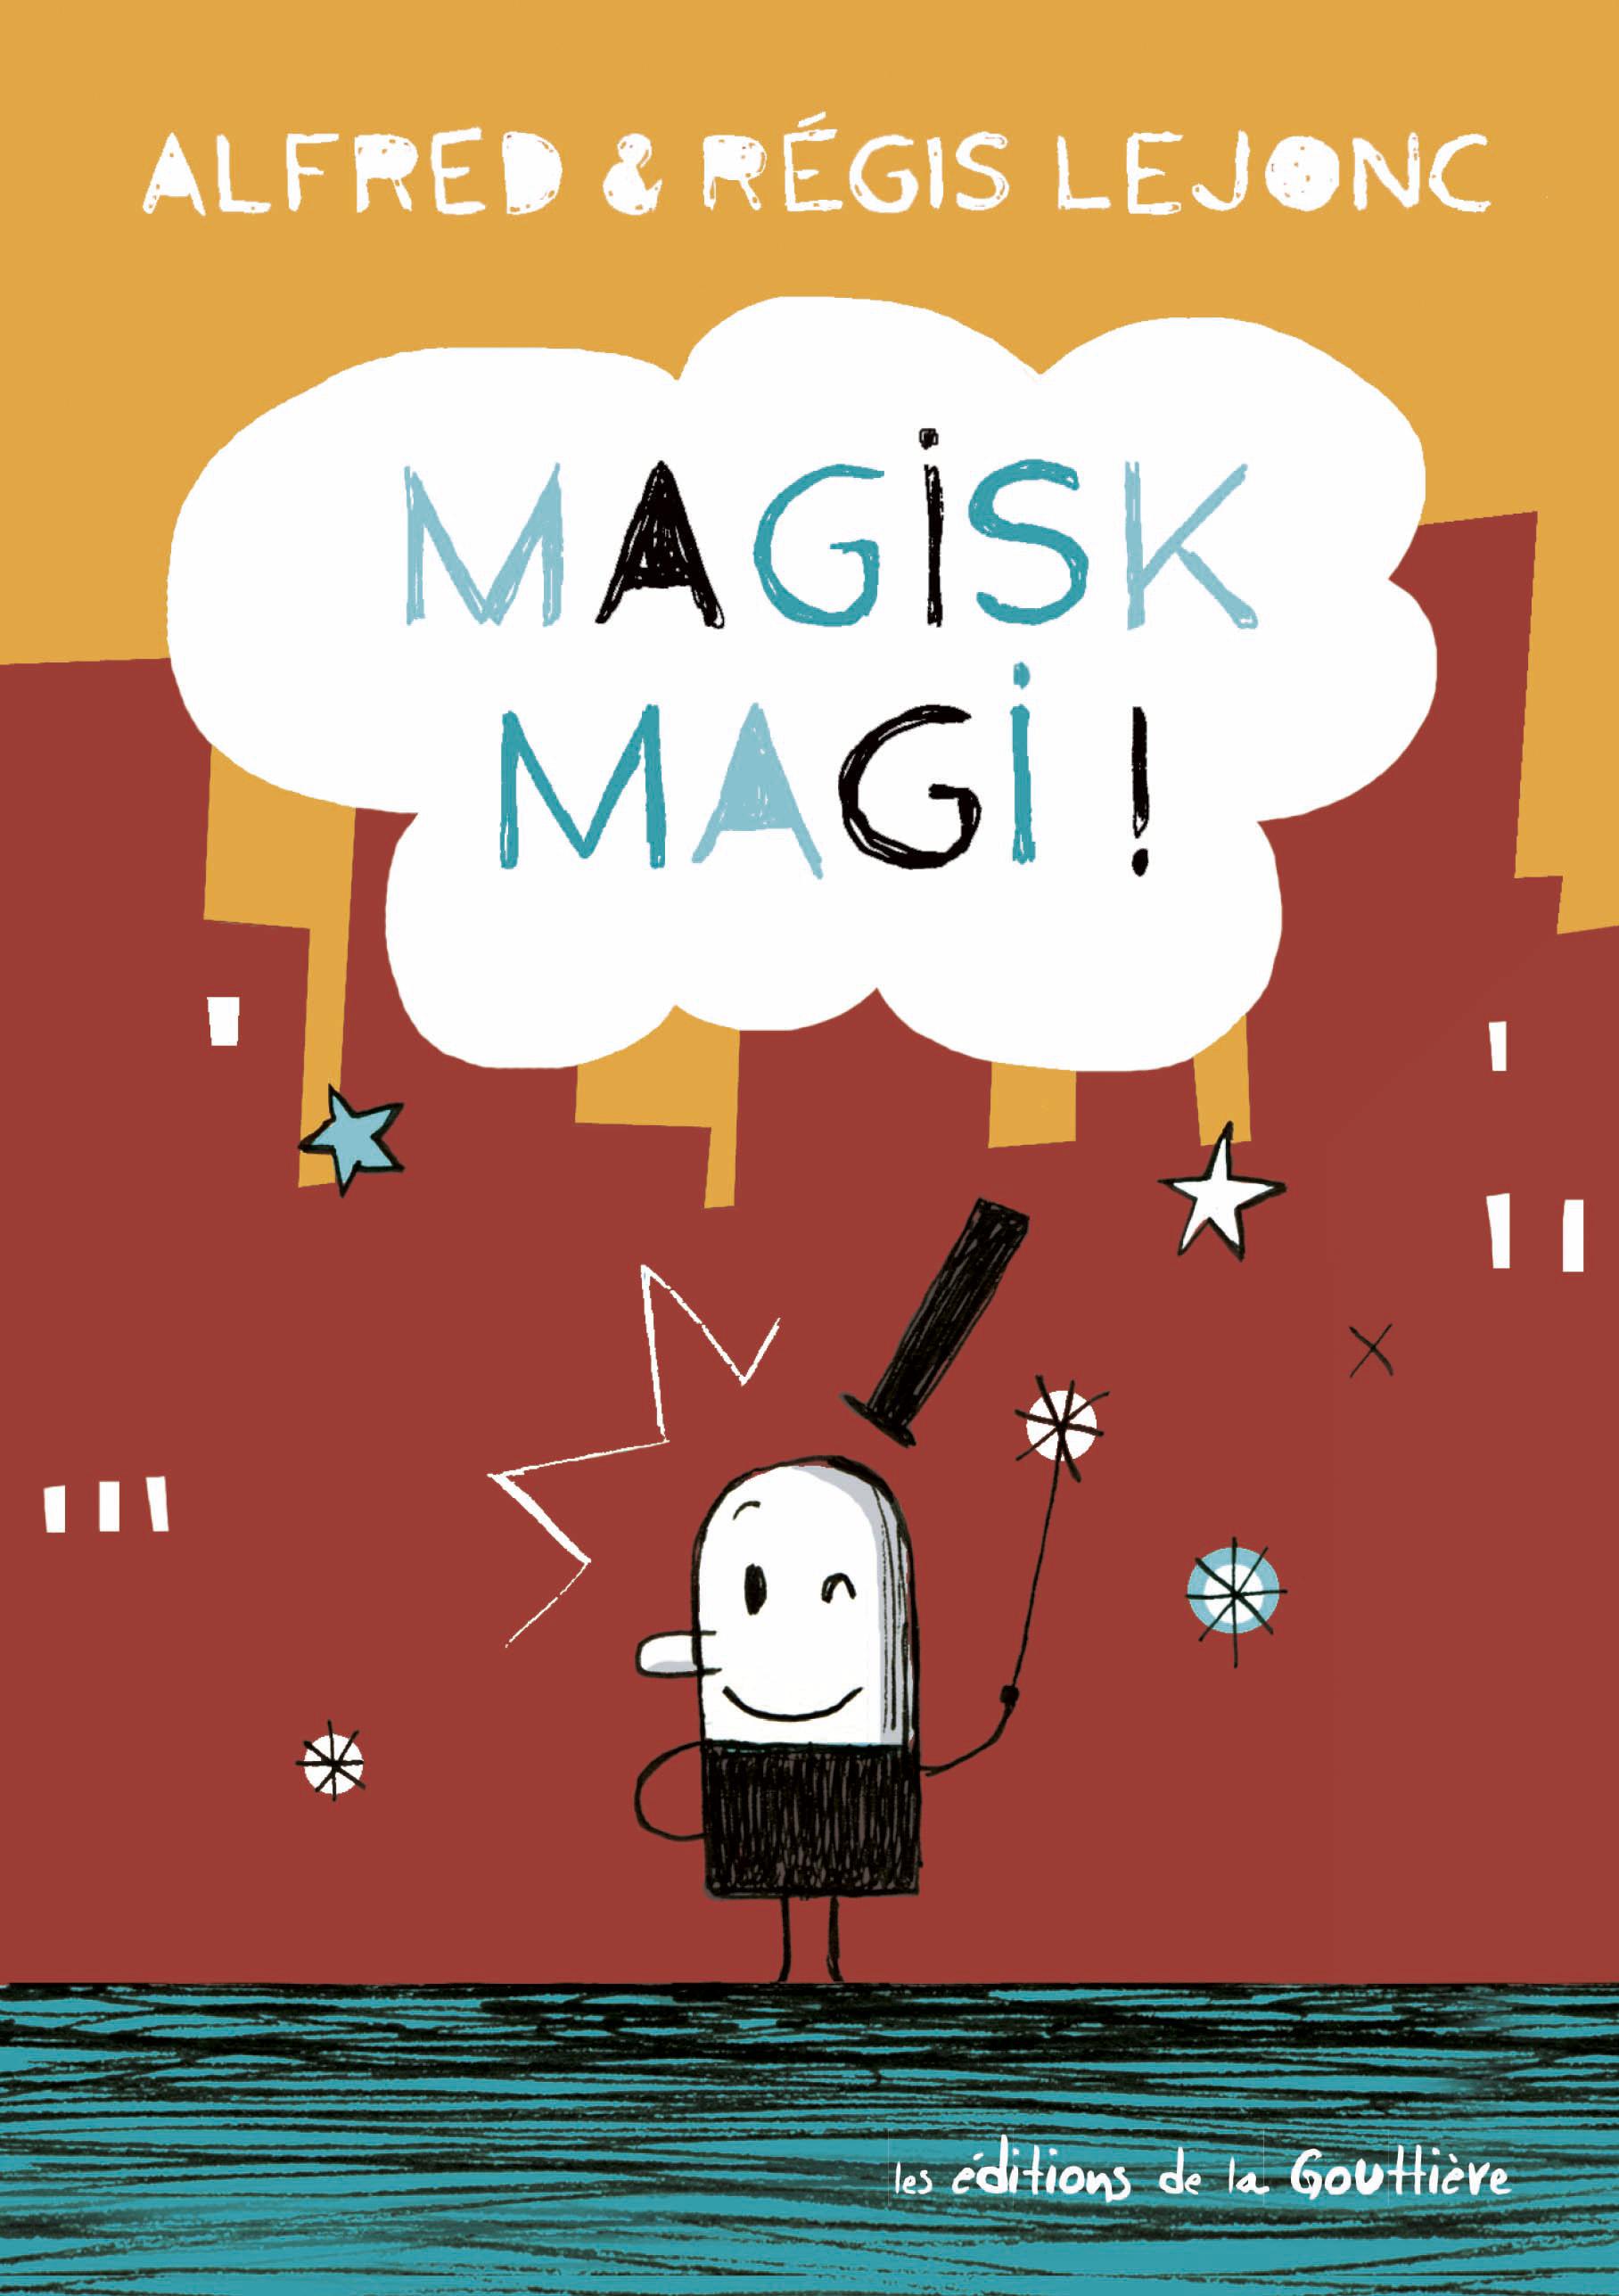 MagiskM_couverture_RVB